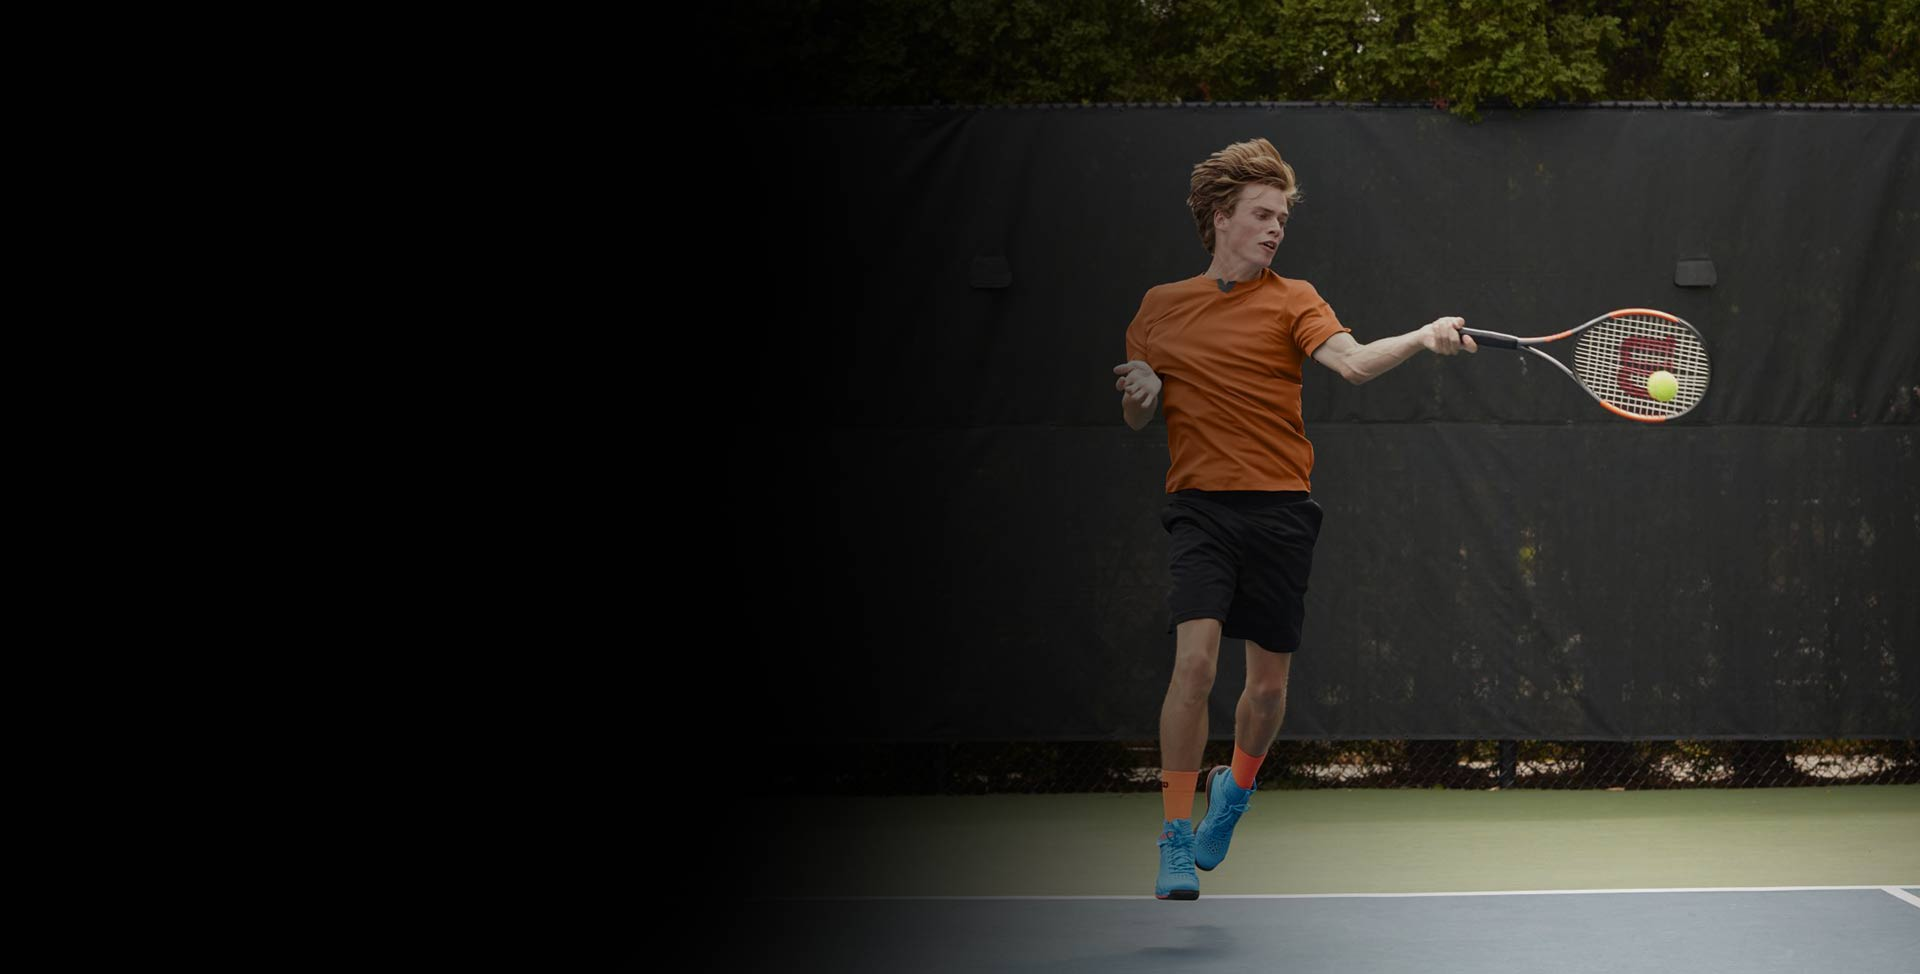 Sydney Tennis Player Hitting Ball